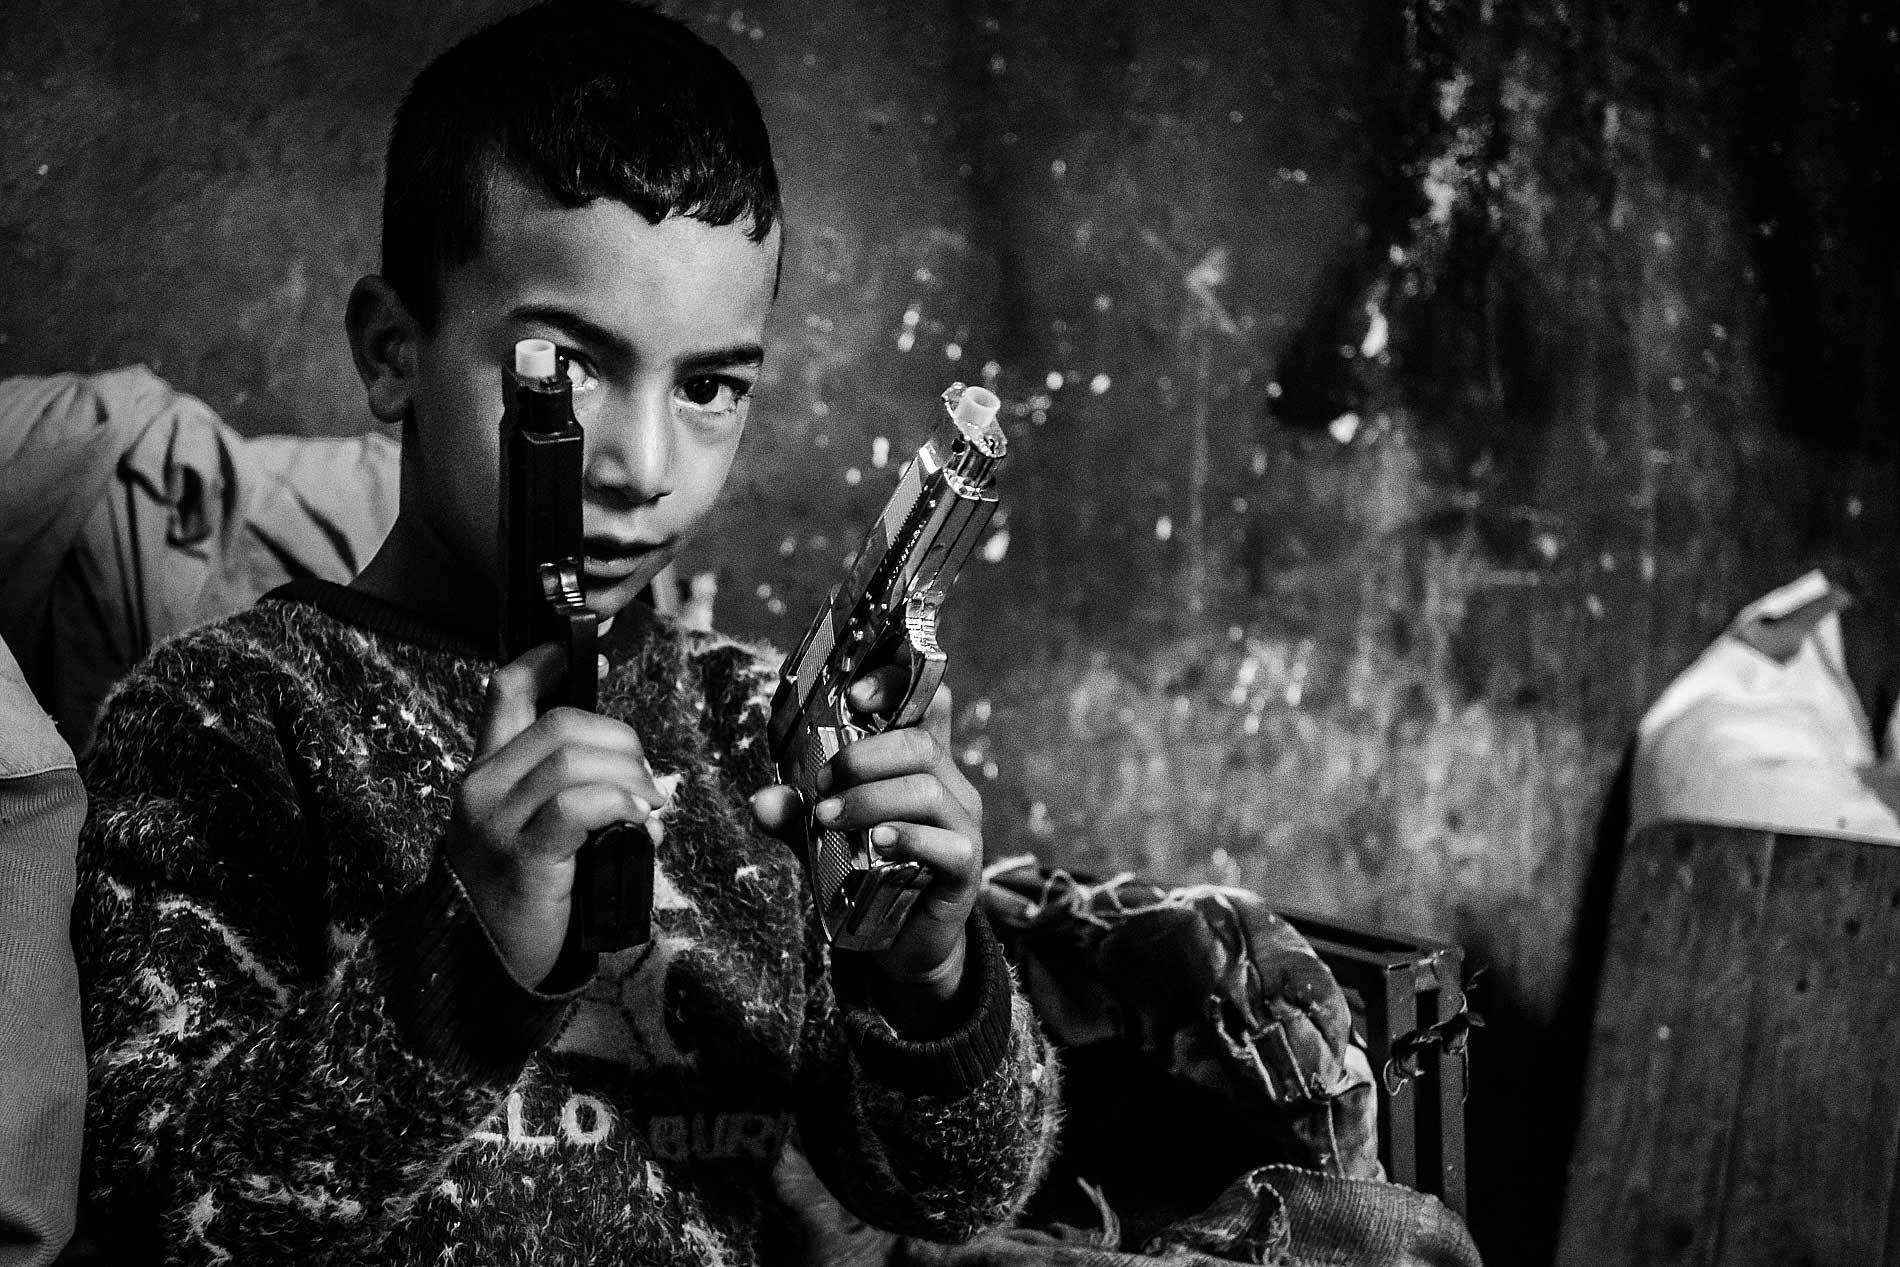 reportage_fotografie_marrakech_martinfrick-0550